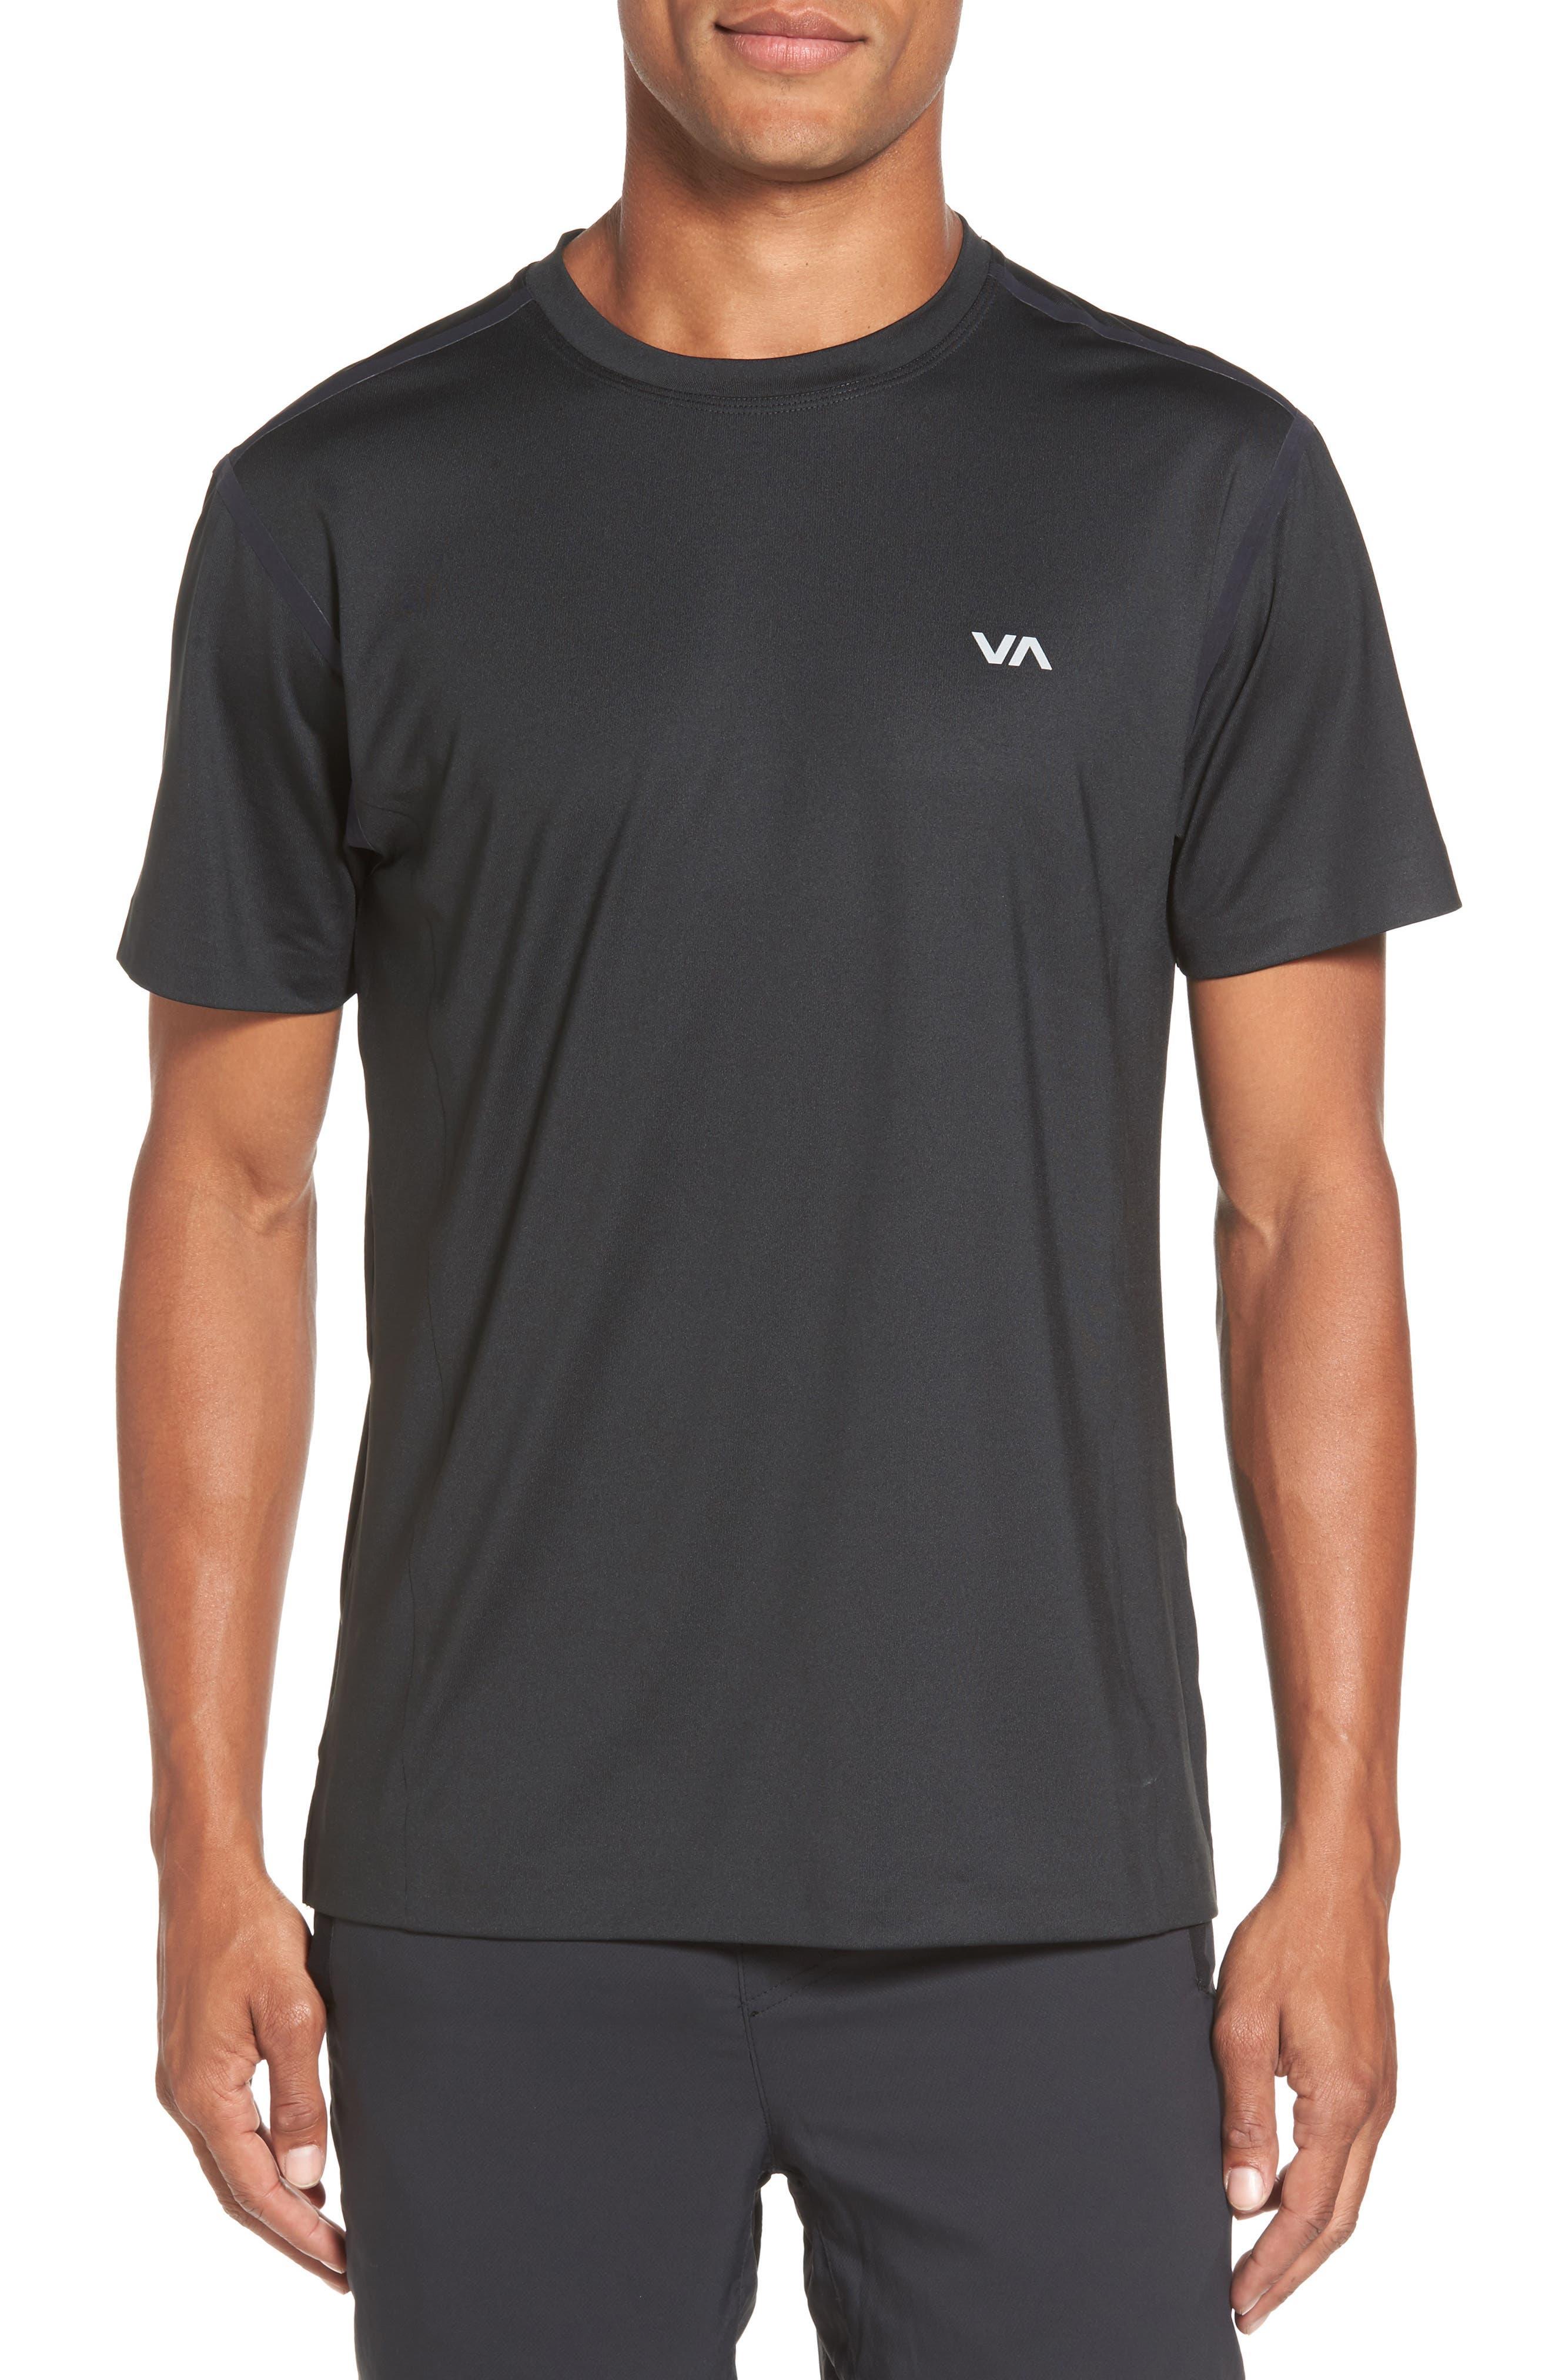 Alternate Image 1 Selected - RVCA VA Compression T-Shirt